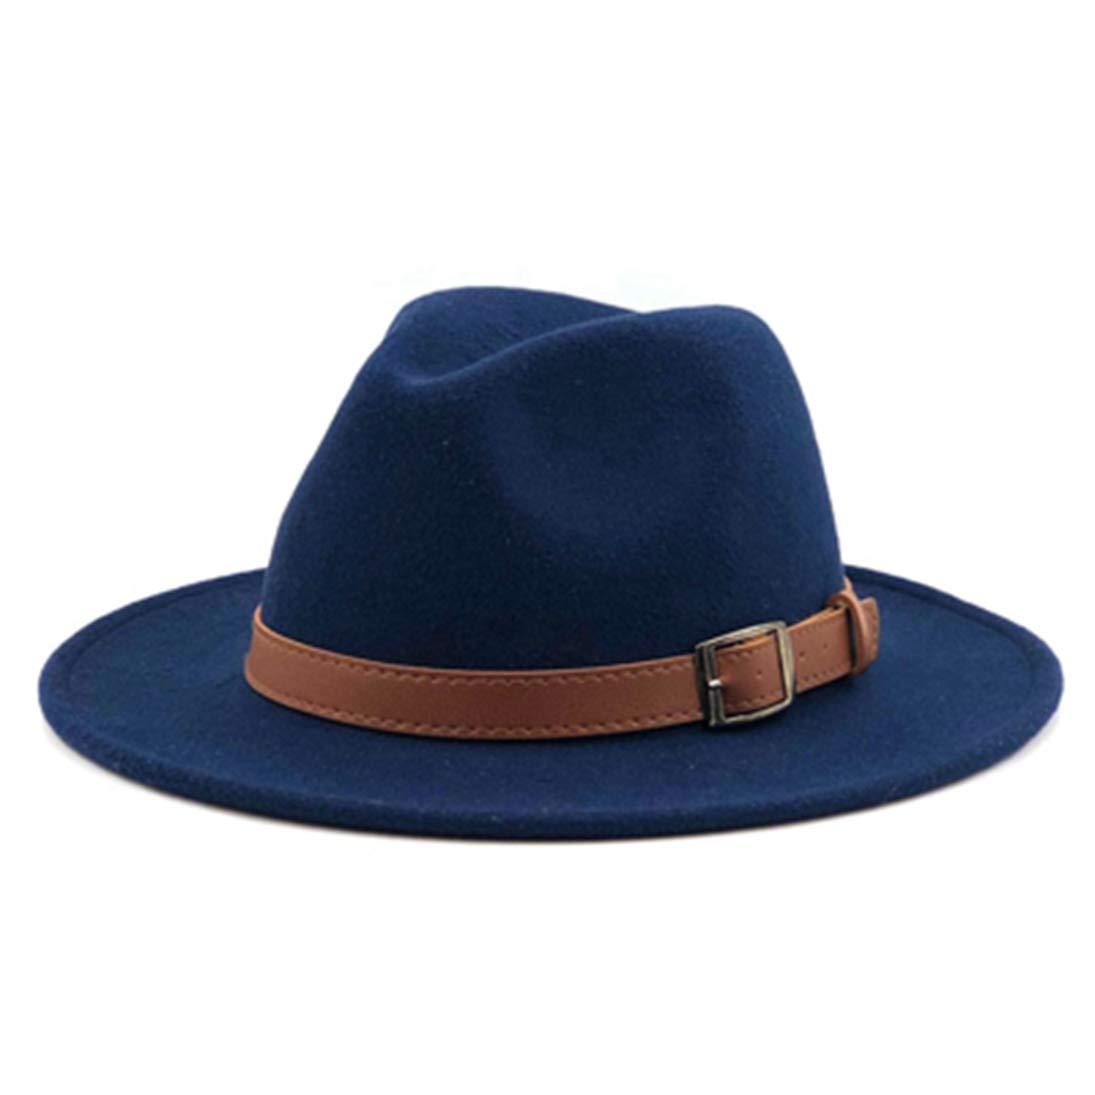 Fedora Hats Unisex Men Women Classic Timeless Wide Brim Wool Felt Trilby Jazz Cap with Black Leather Buckle Belt